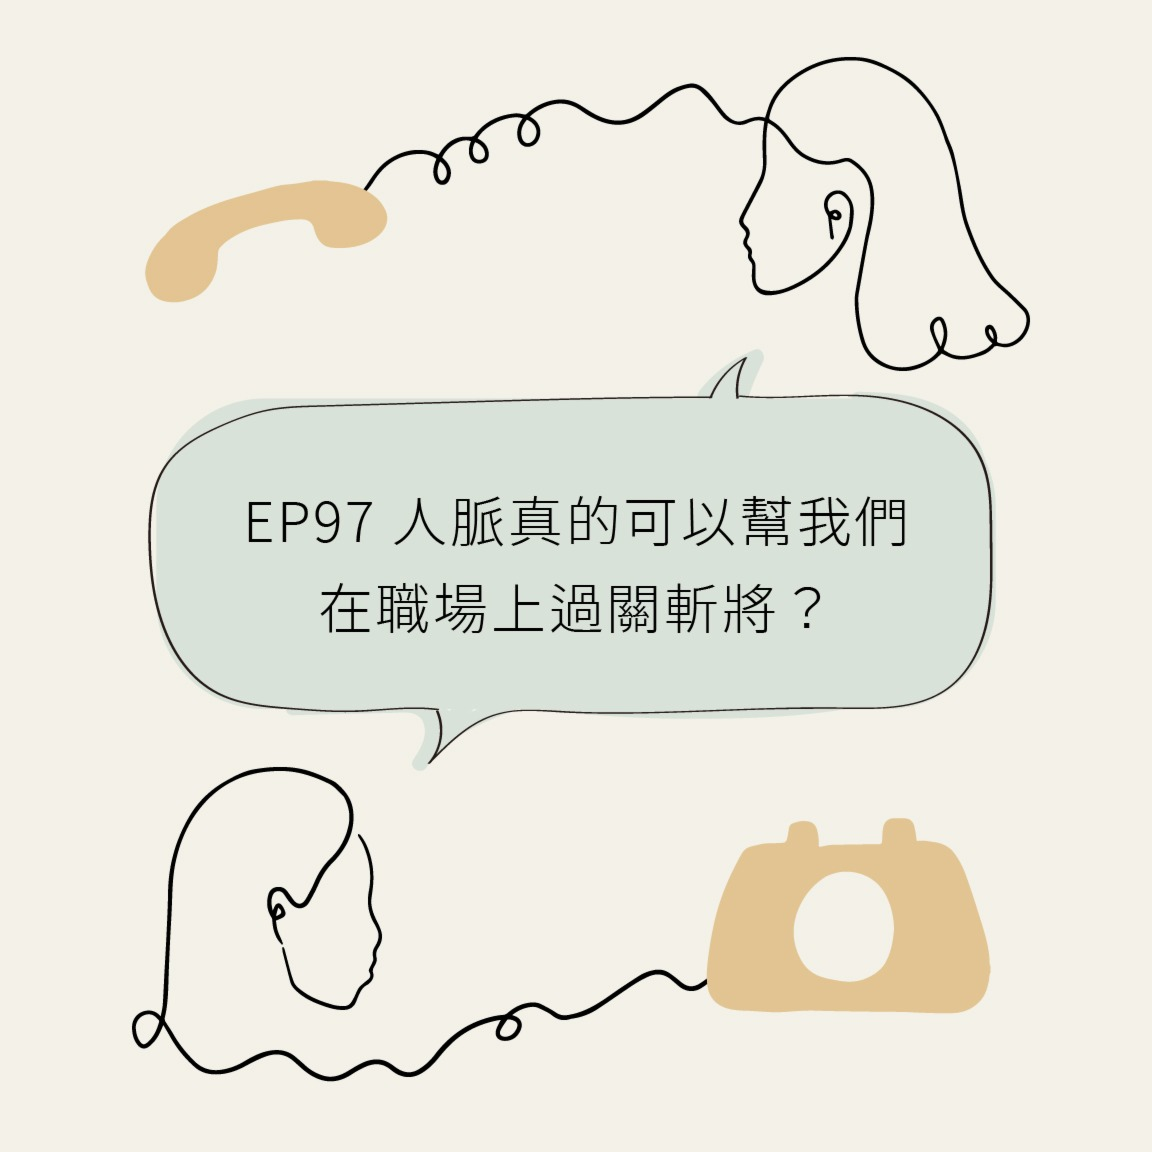 EP97 人脉真的可以帮我们在职场上过关斩将?